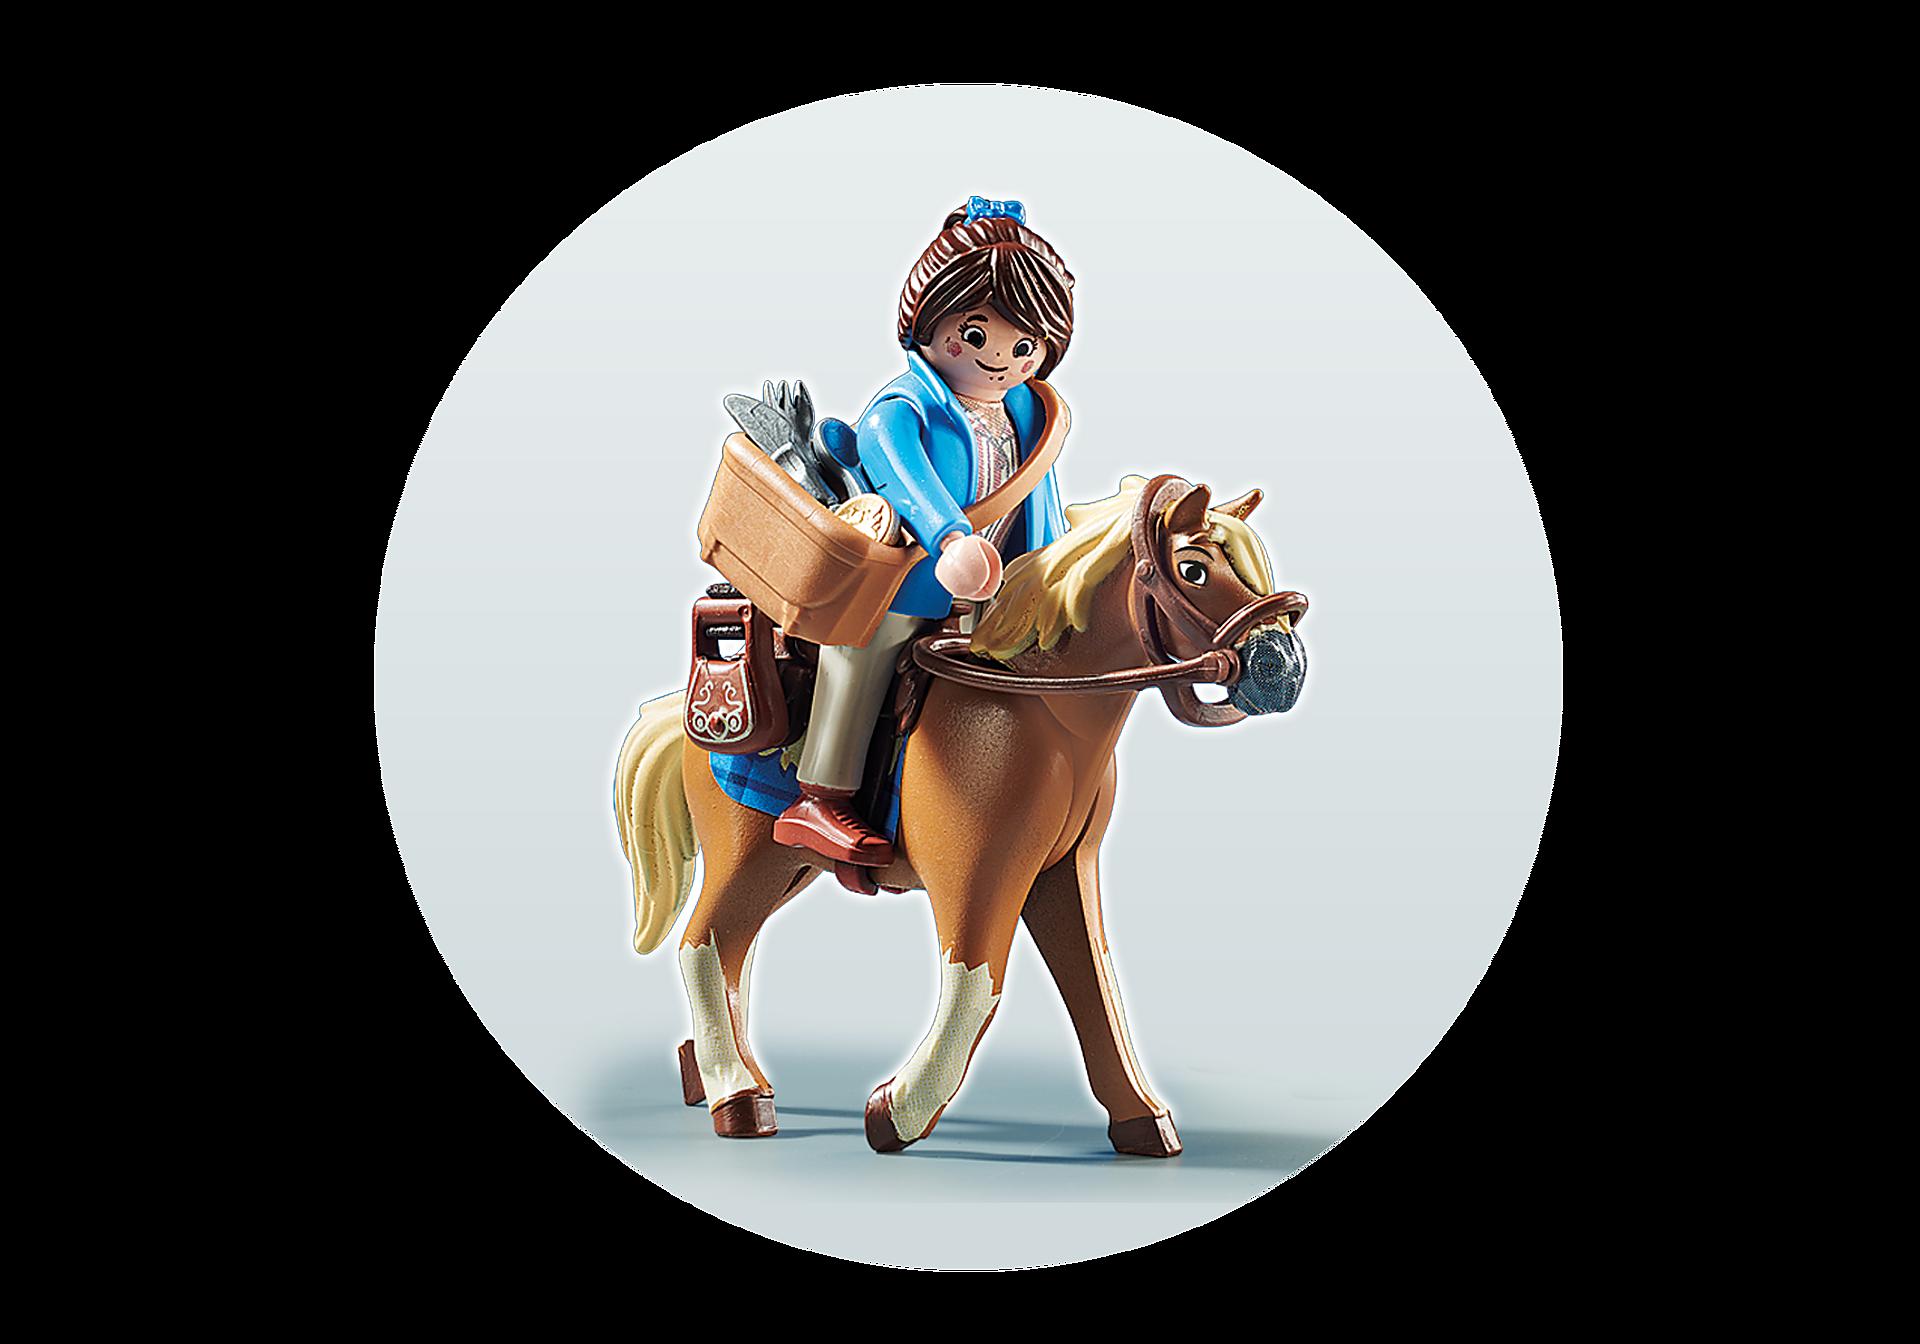 70072 PLAYMOBIL: THE MOVIE Marla con Caballo zoom image4